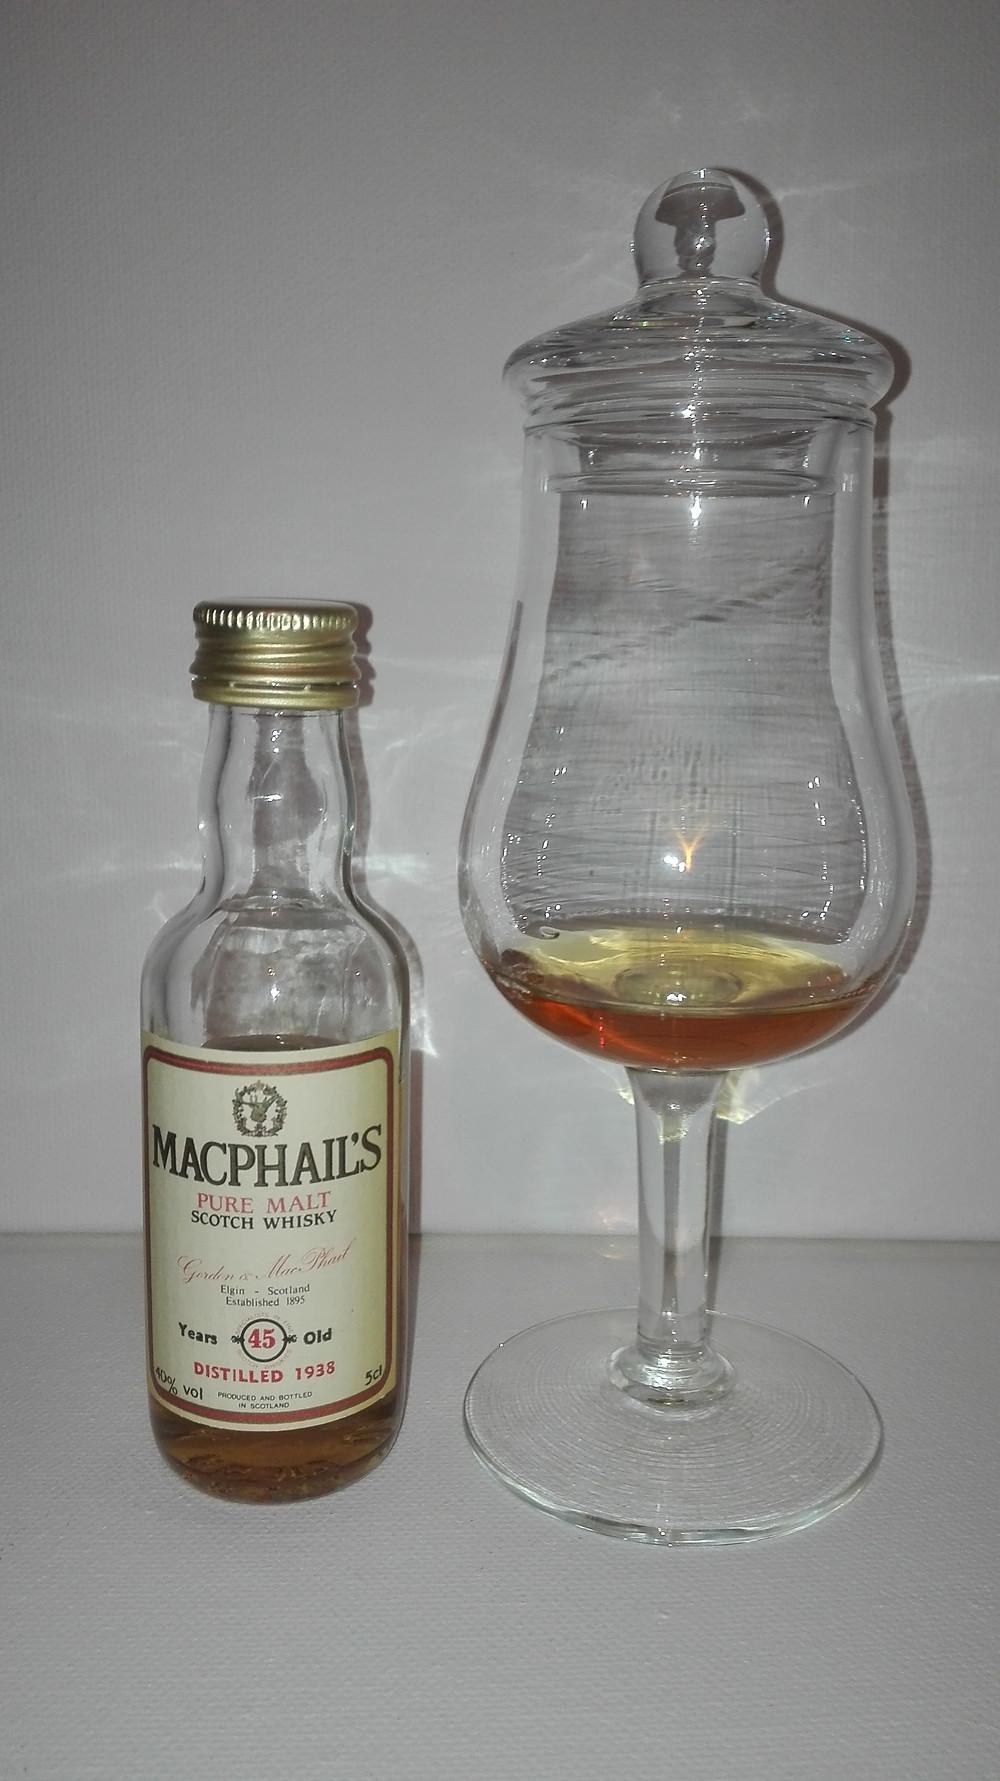 Gordon&Macphail, Macphail´s 1938, 45 years, Whisky, distilled 1938